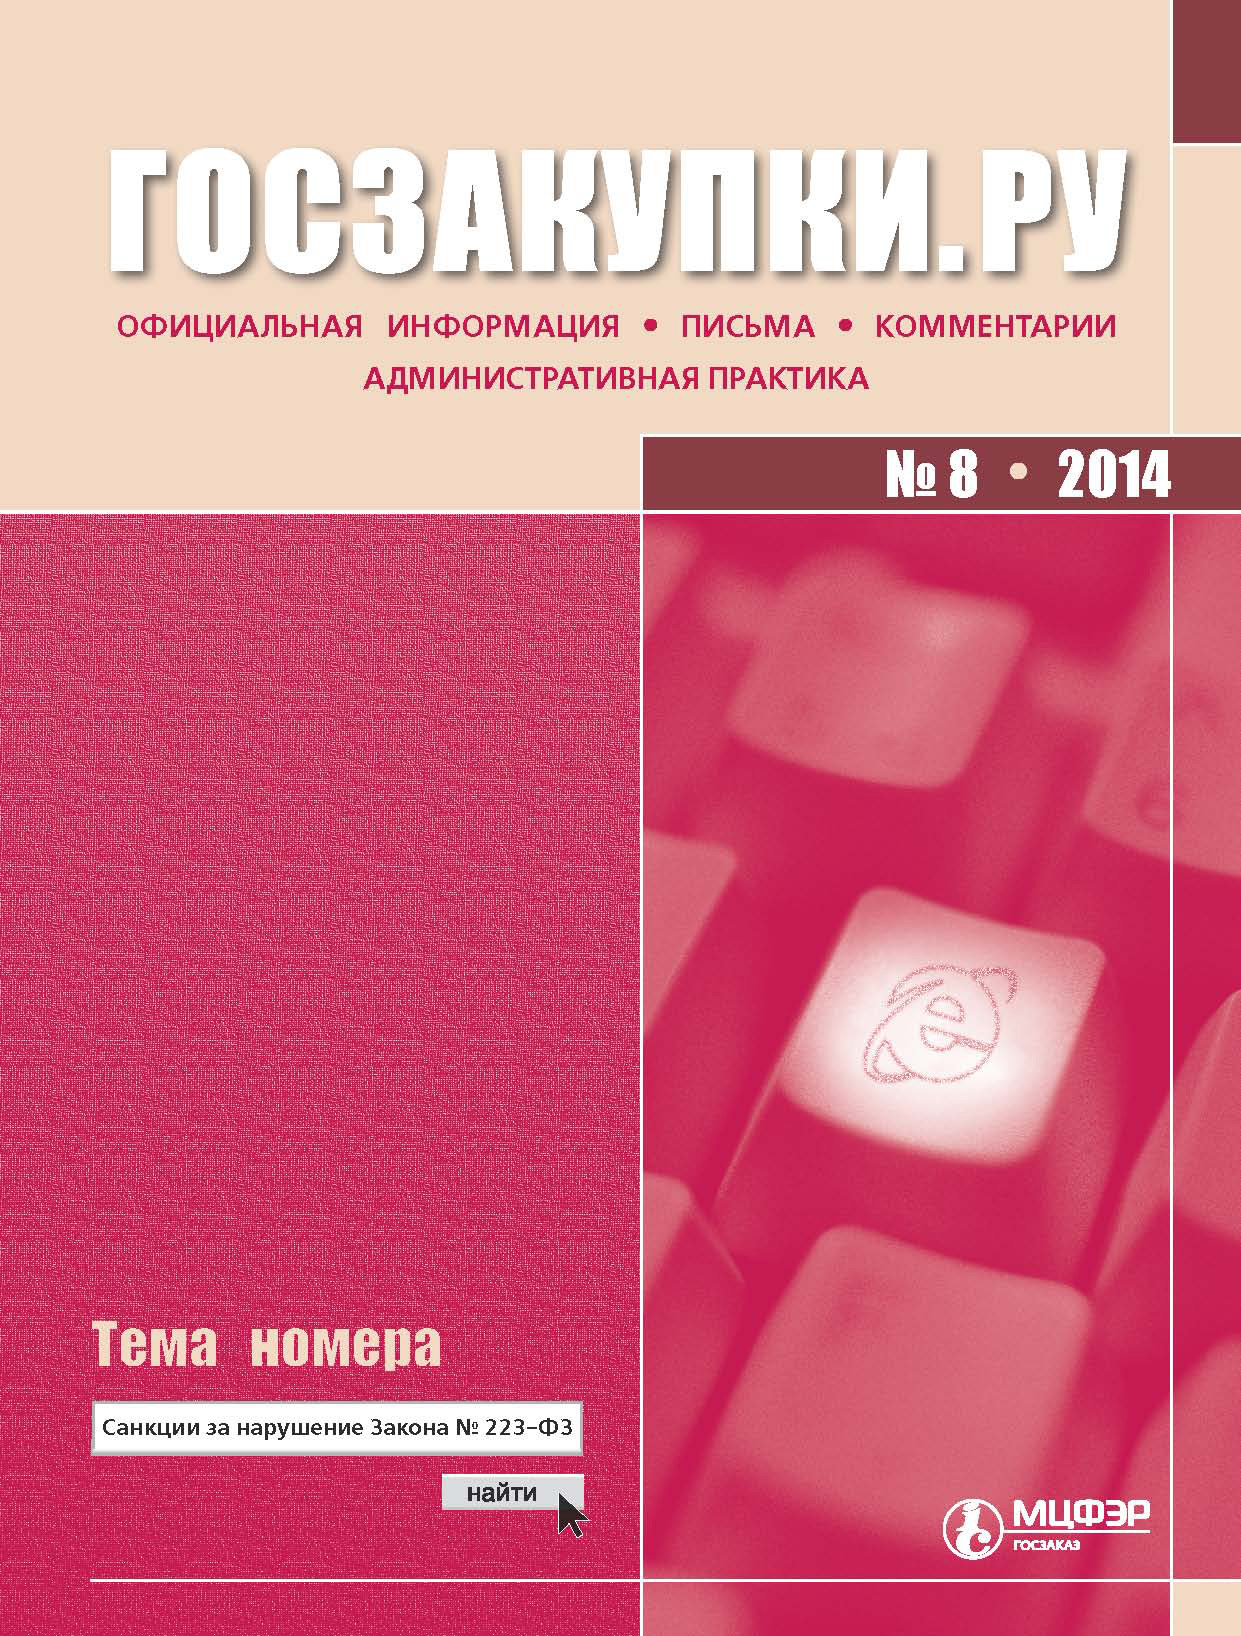 Госзакупки.ру № 8 2014